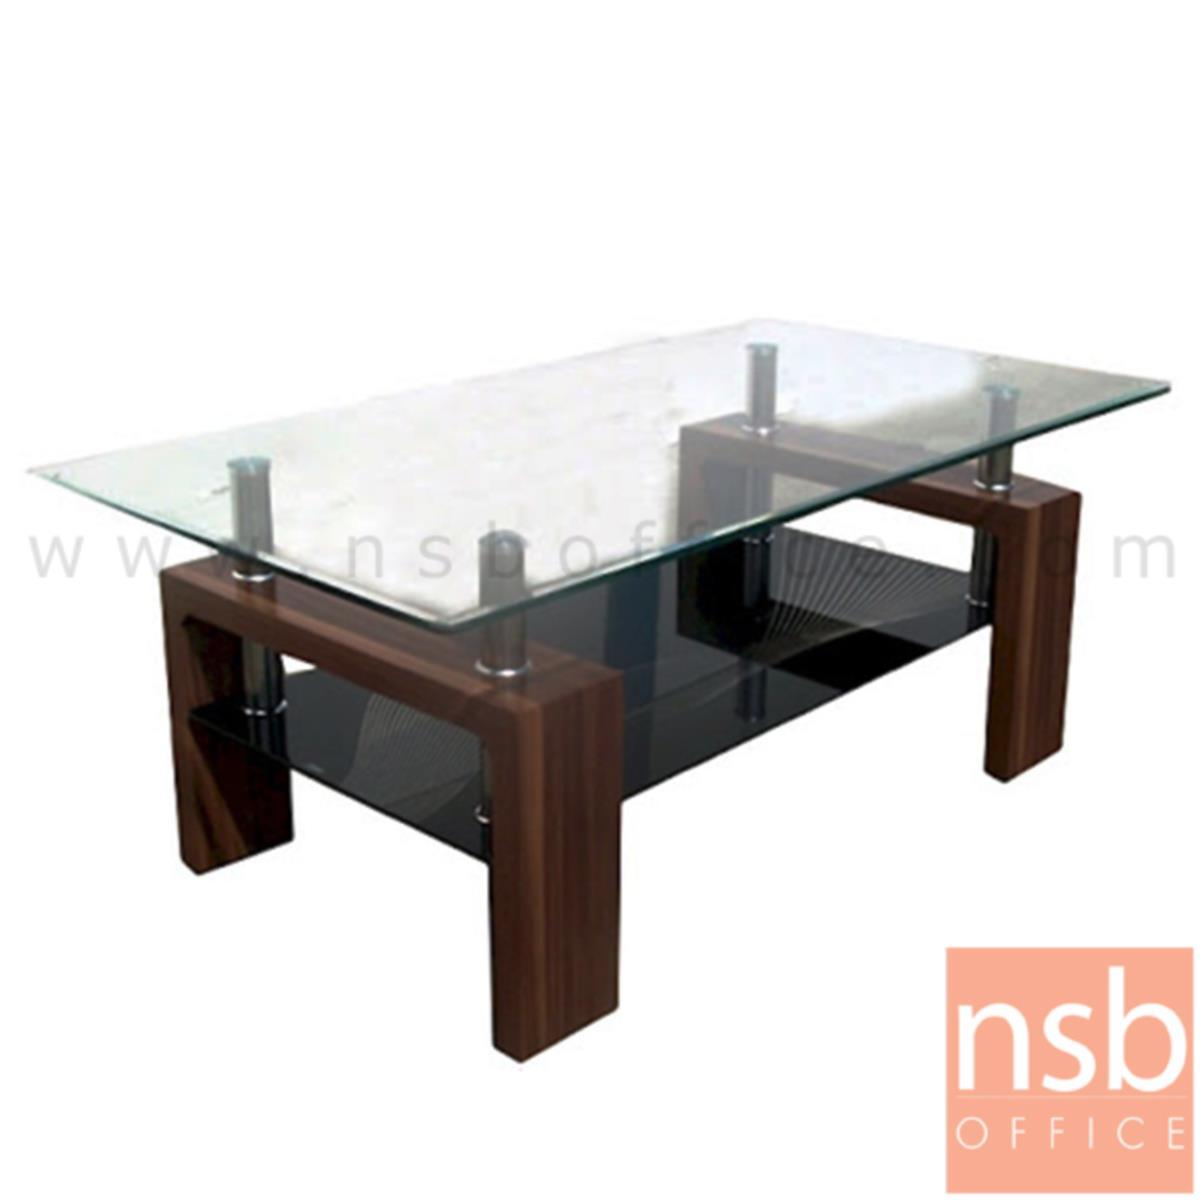 B13A172:โต๊ะกลางกระจก  รุ่น Cormac (คอร์แม็ค) ขนาด 110W cm. ขาลายไม้มะฮอกกานีเงา